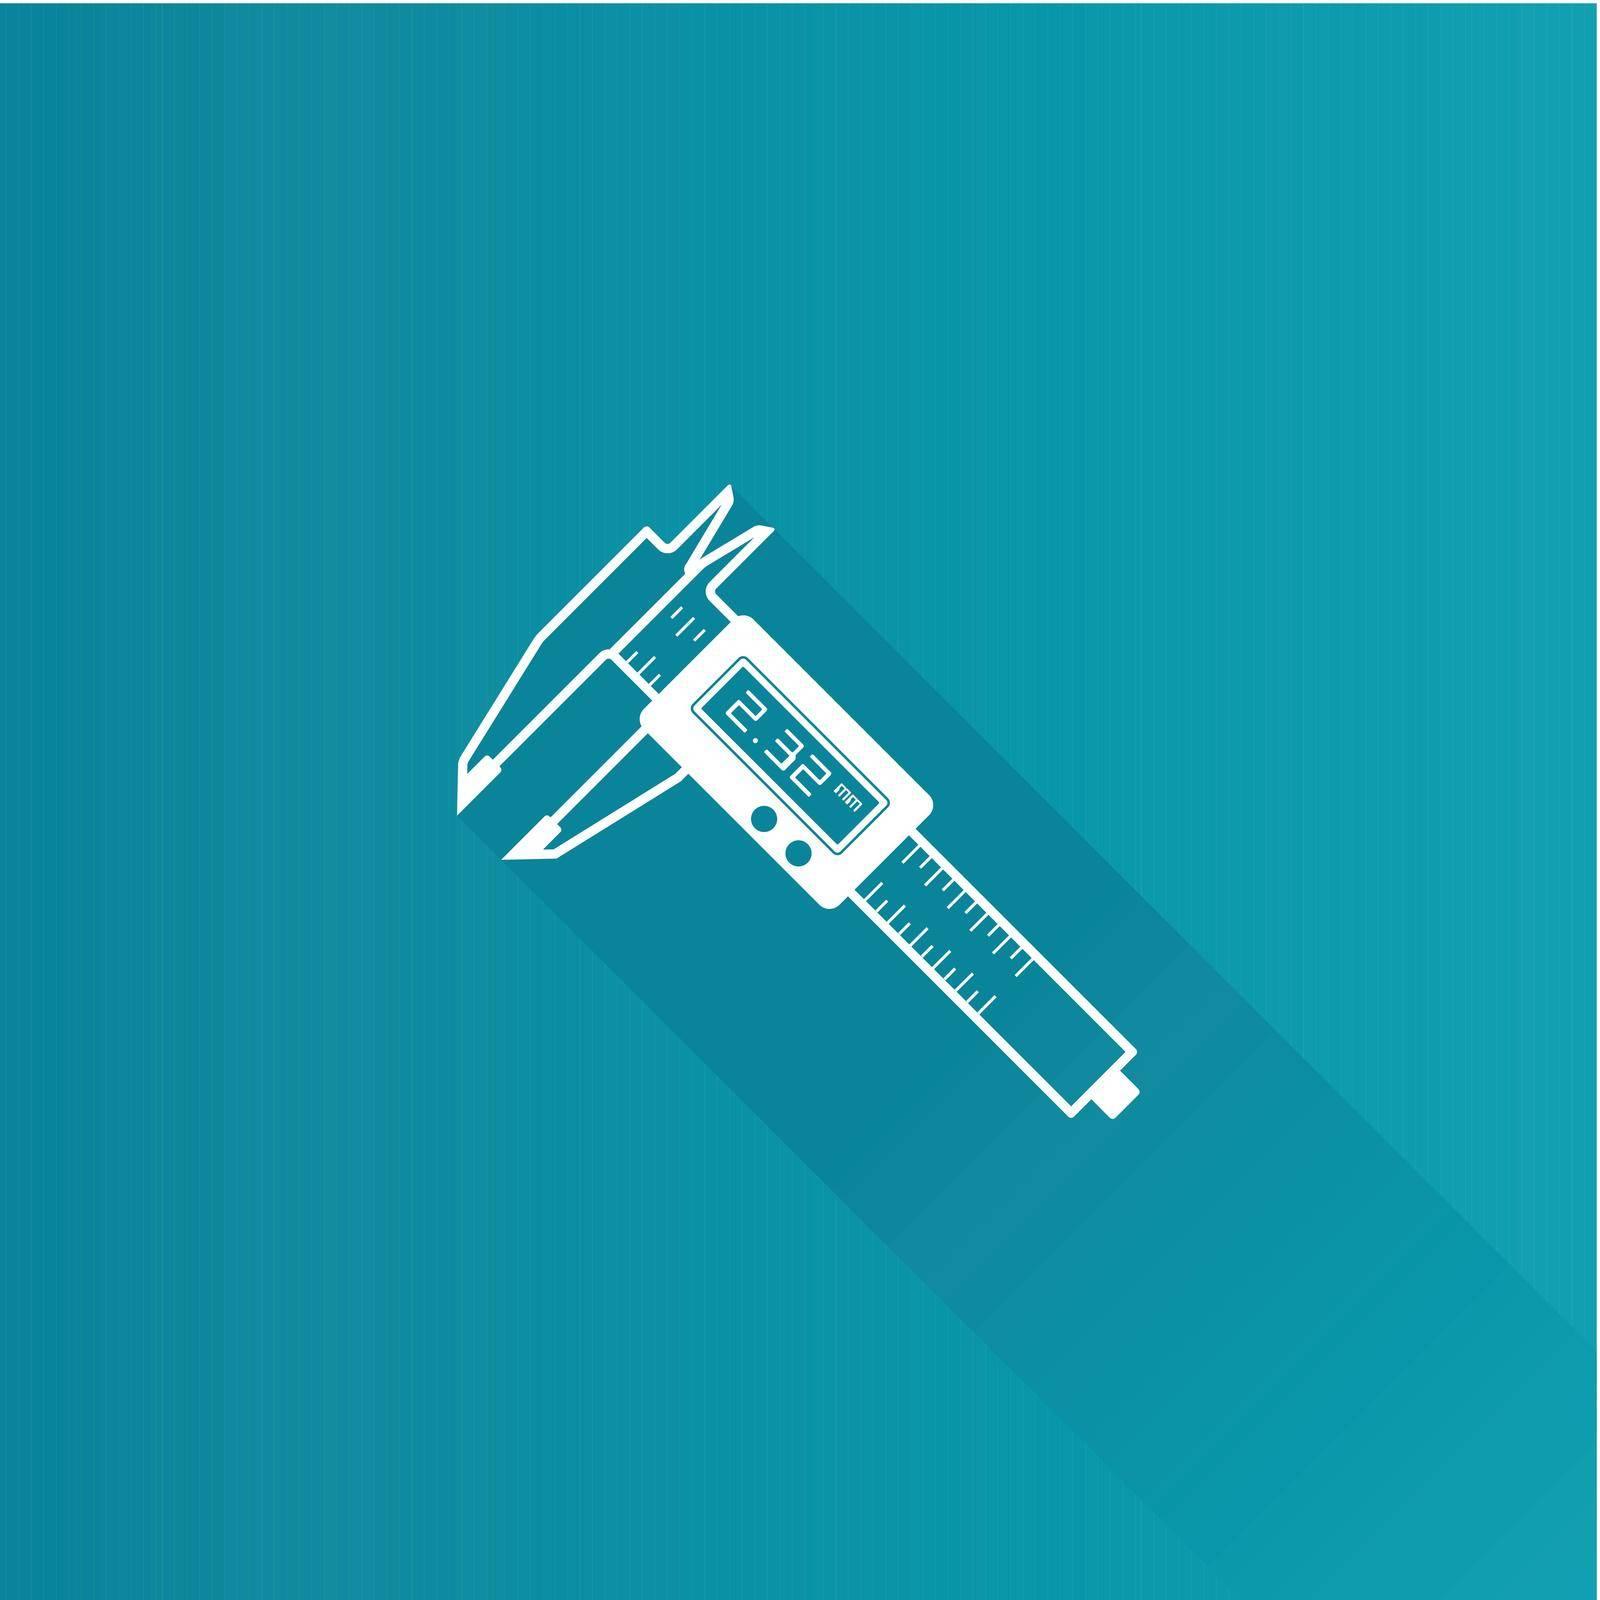 Digital caliper icon in Metro user interface color style. Instrument equipment measurement